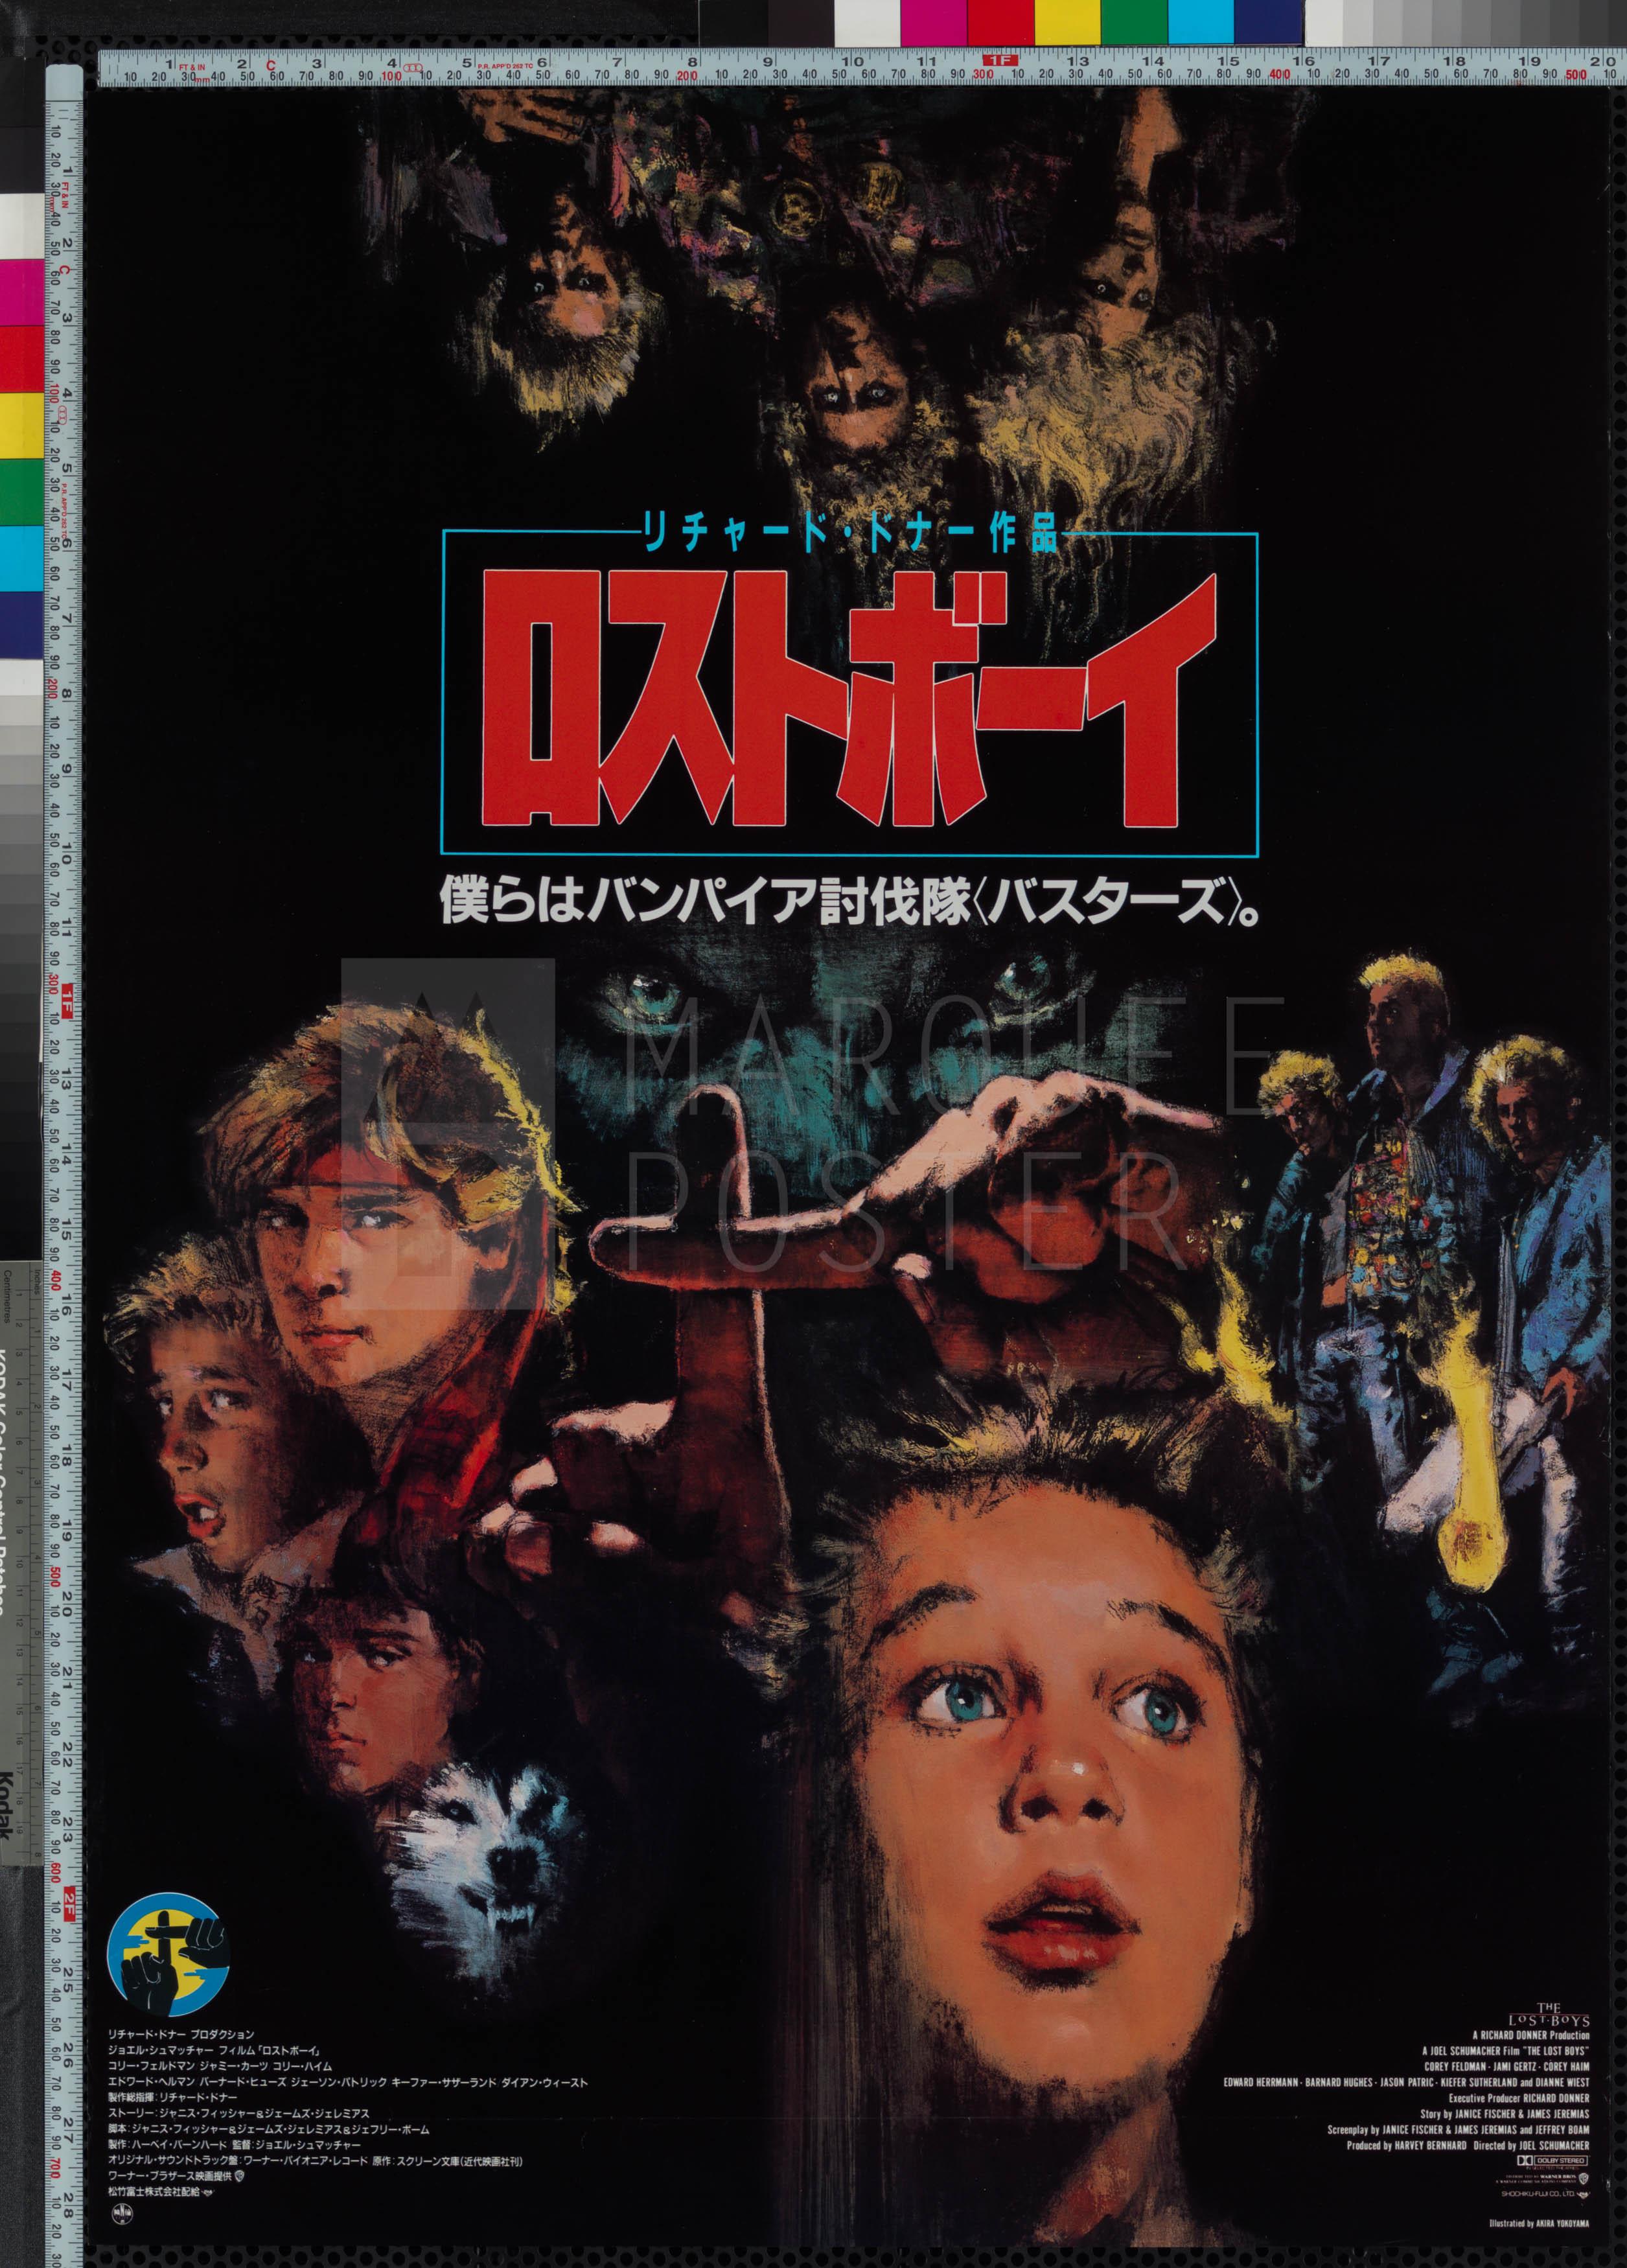 7-lost-boys-art-style-japanese-b2-1987-02